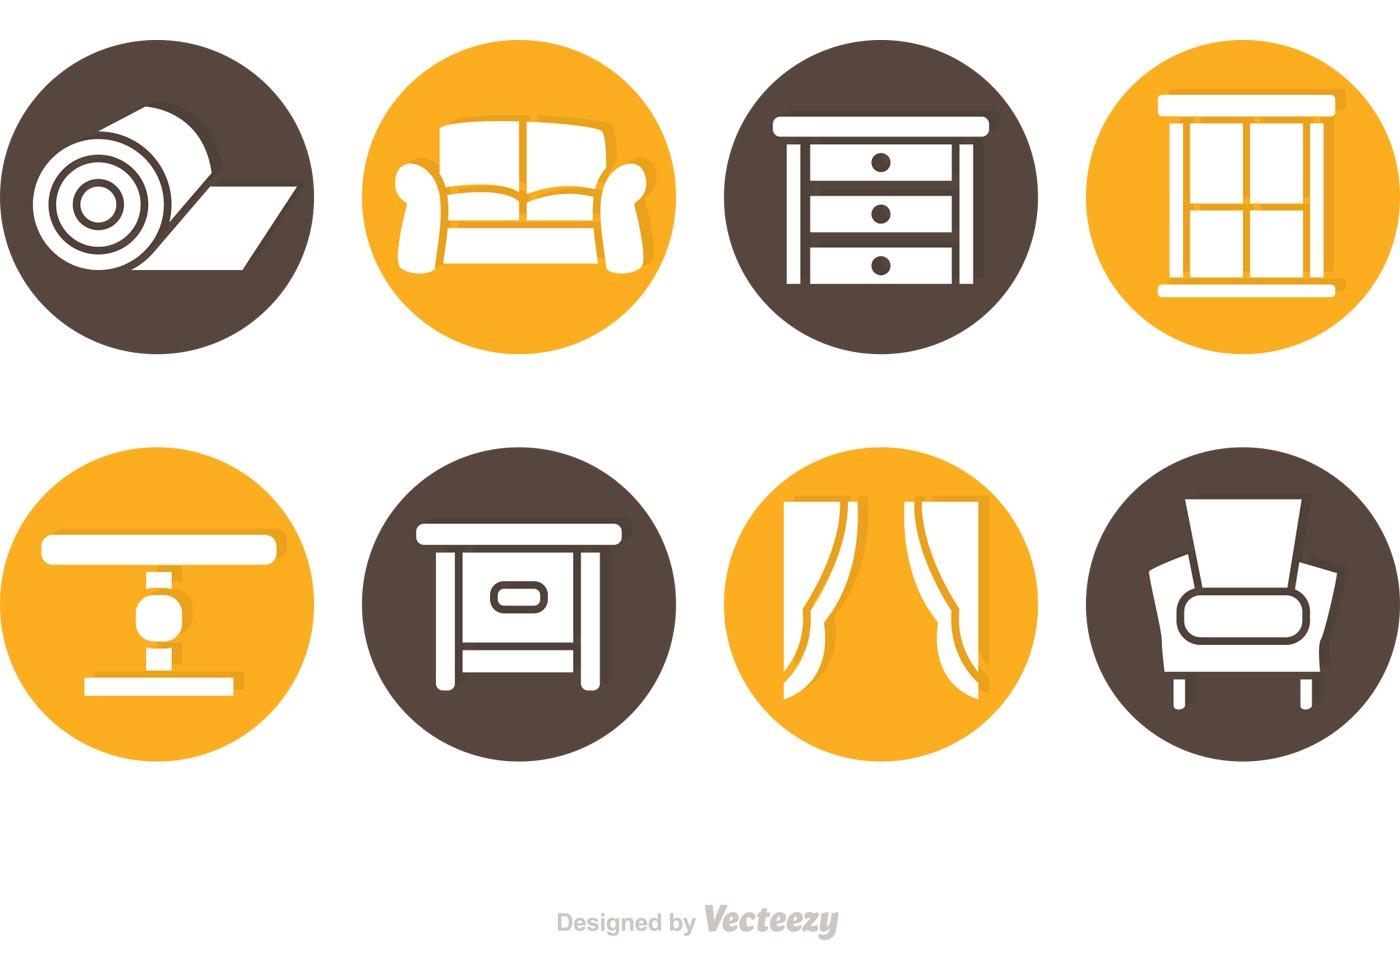 Circlular Home Interior Icon Vectors Download Free Home Decorators Catalog Best Ideas of Home Decor and Design [homedecoratorscatalog.us]